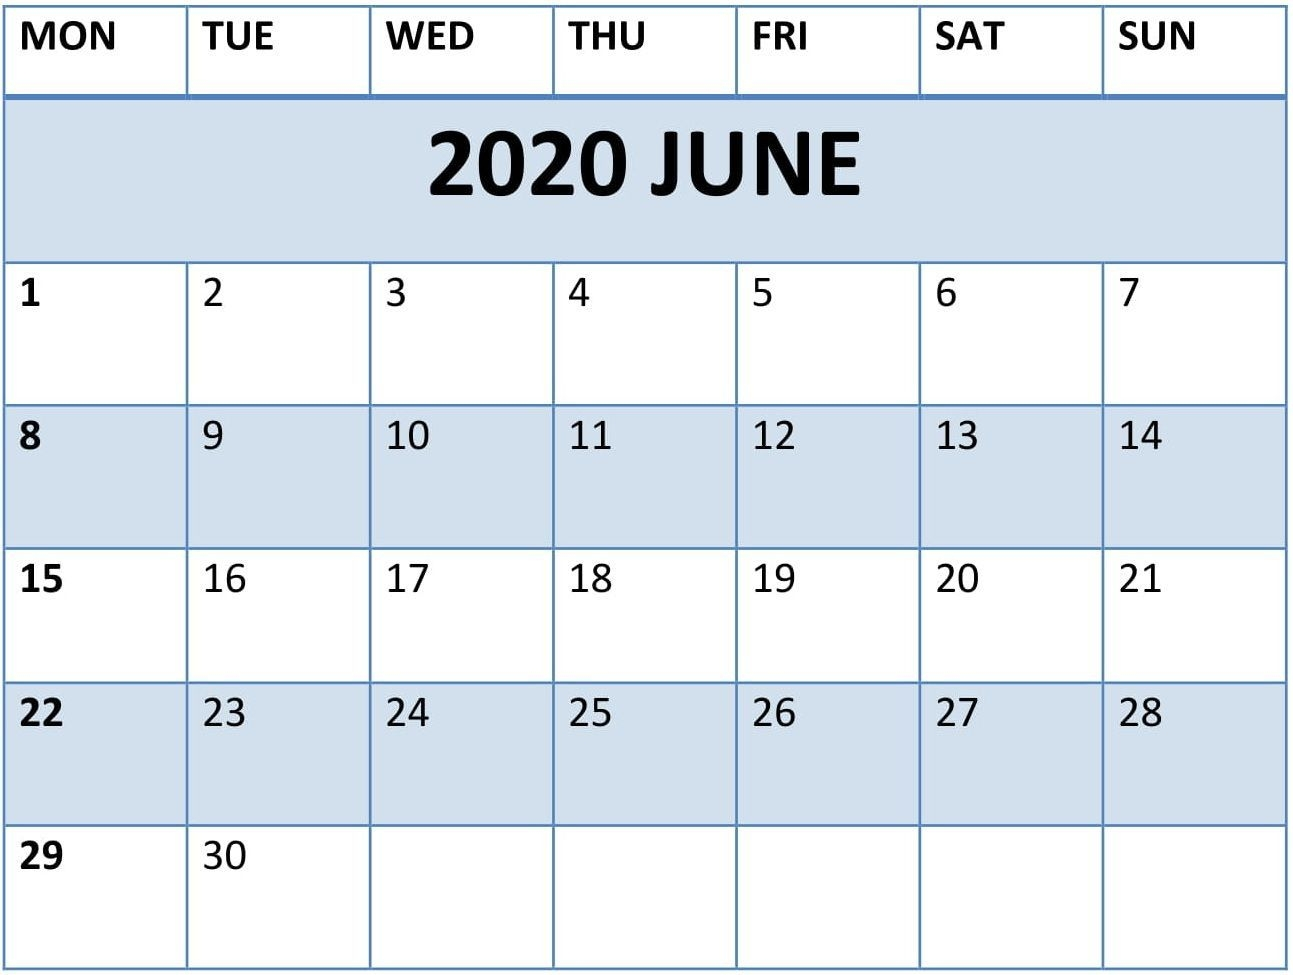 Print June Calendar 2020 Free Blank Editable Template - Pdf